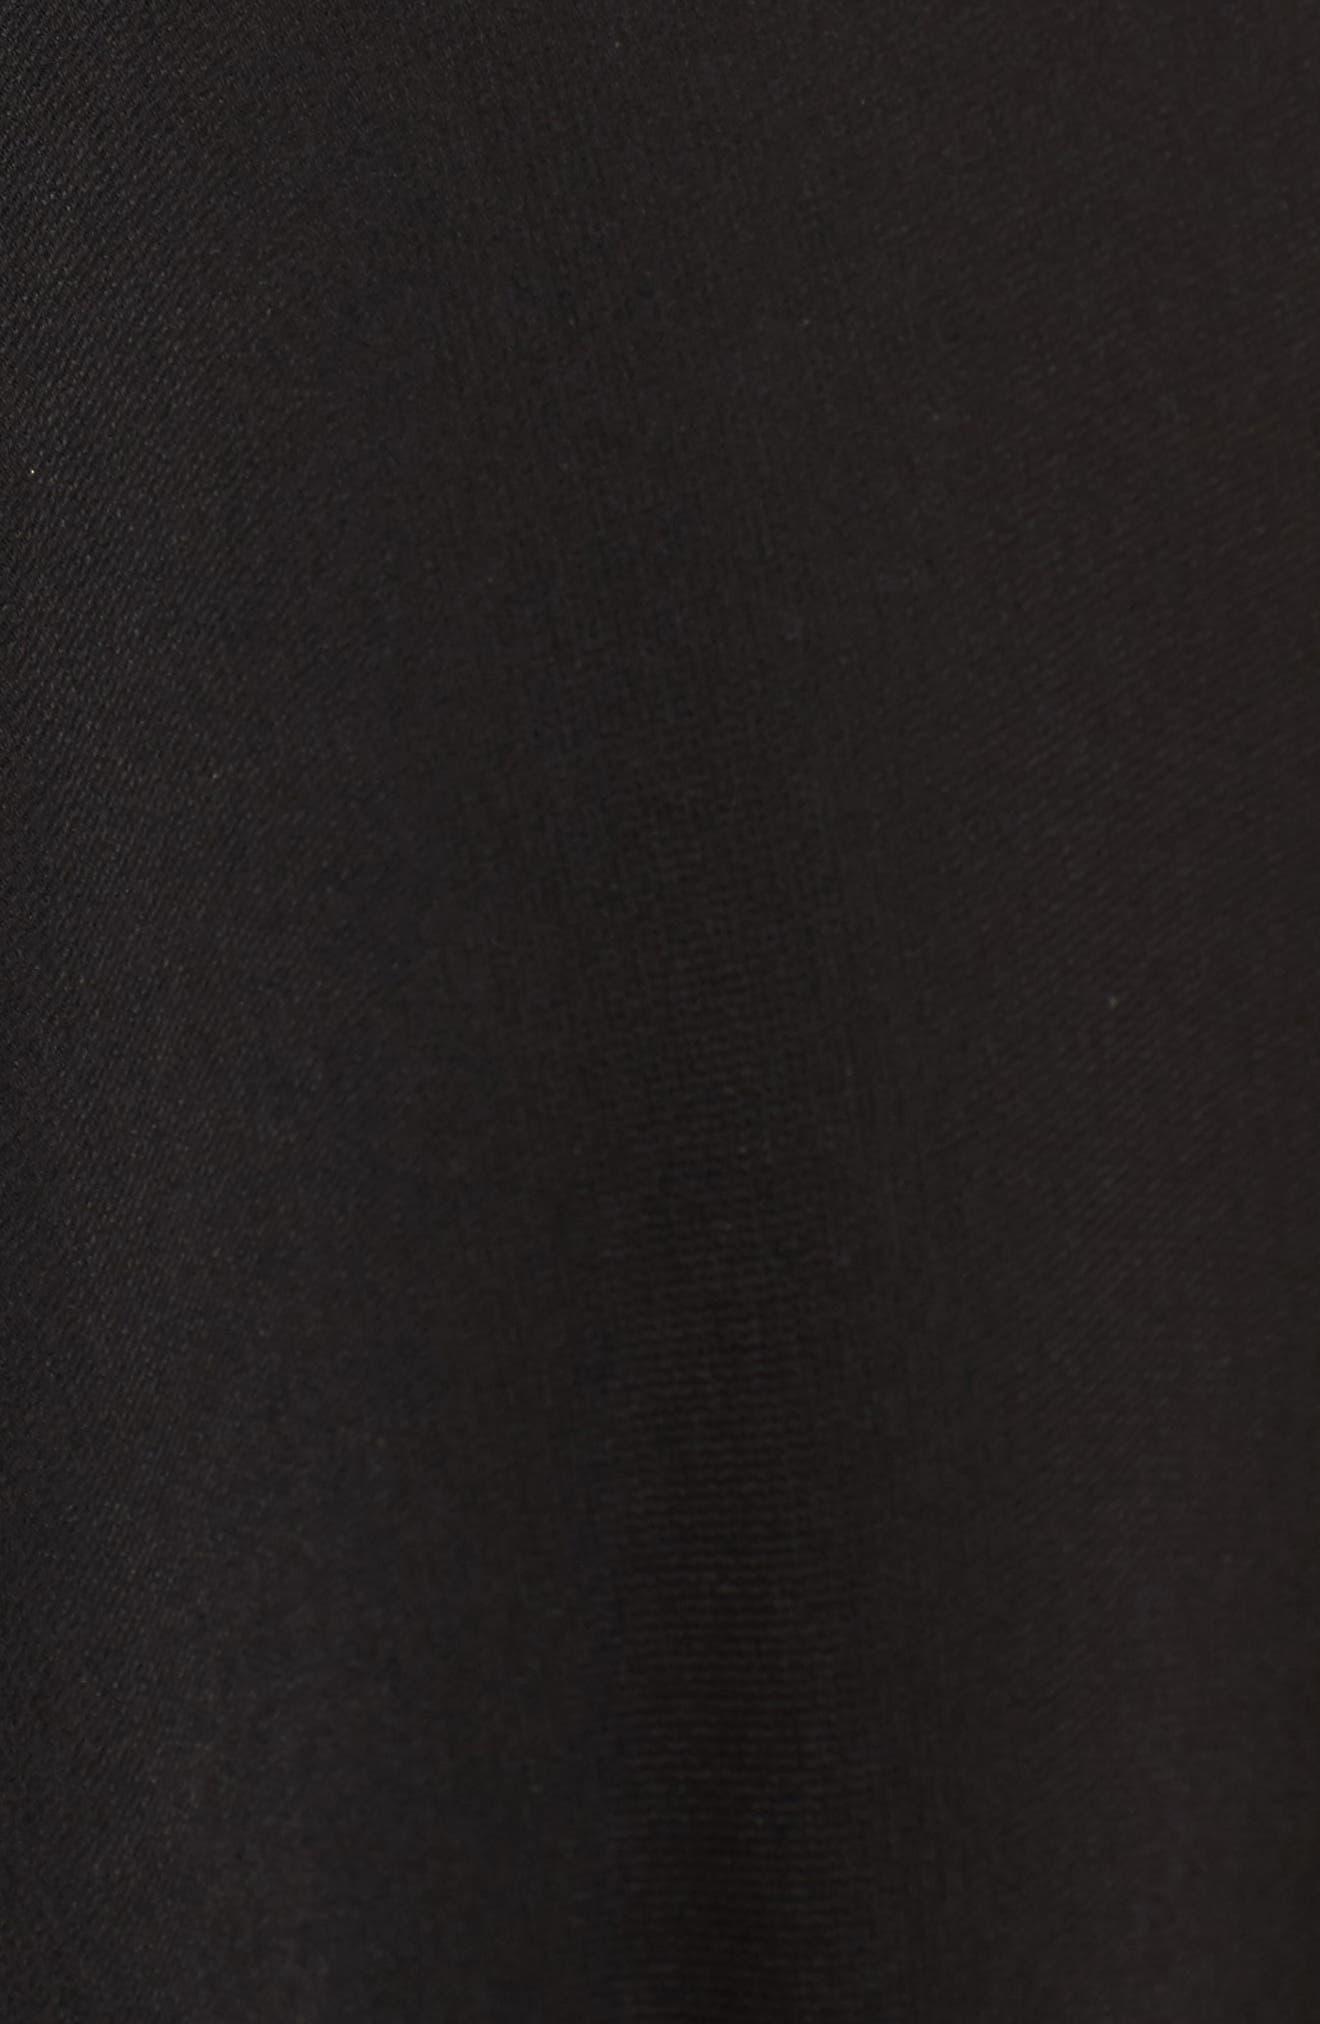 Kerry Maxi Dress,                             Alternate thumbnail 5, color,                             Black